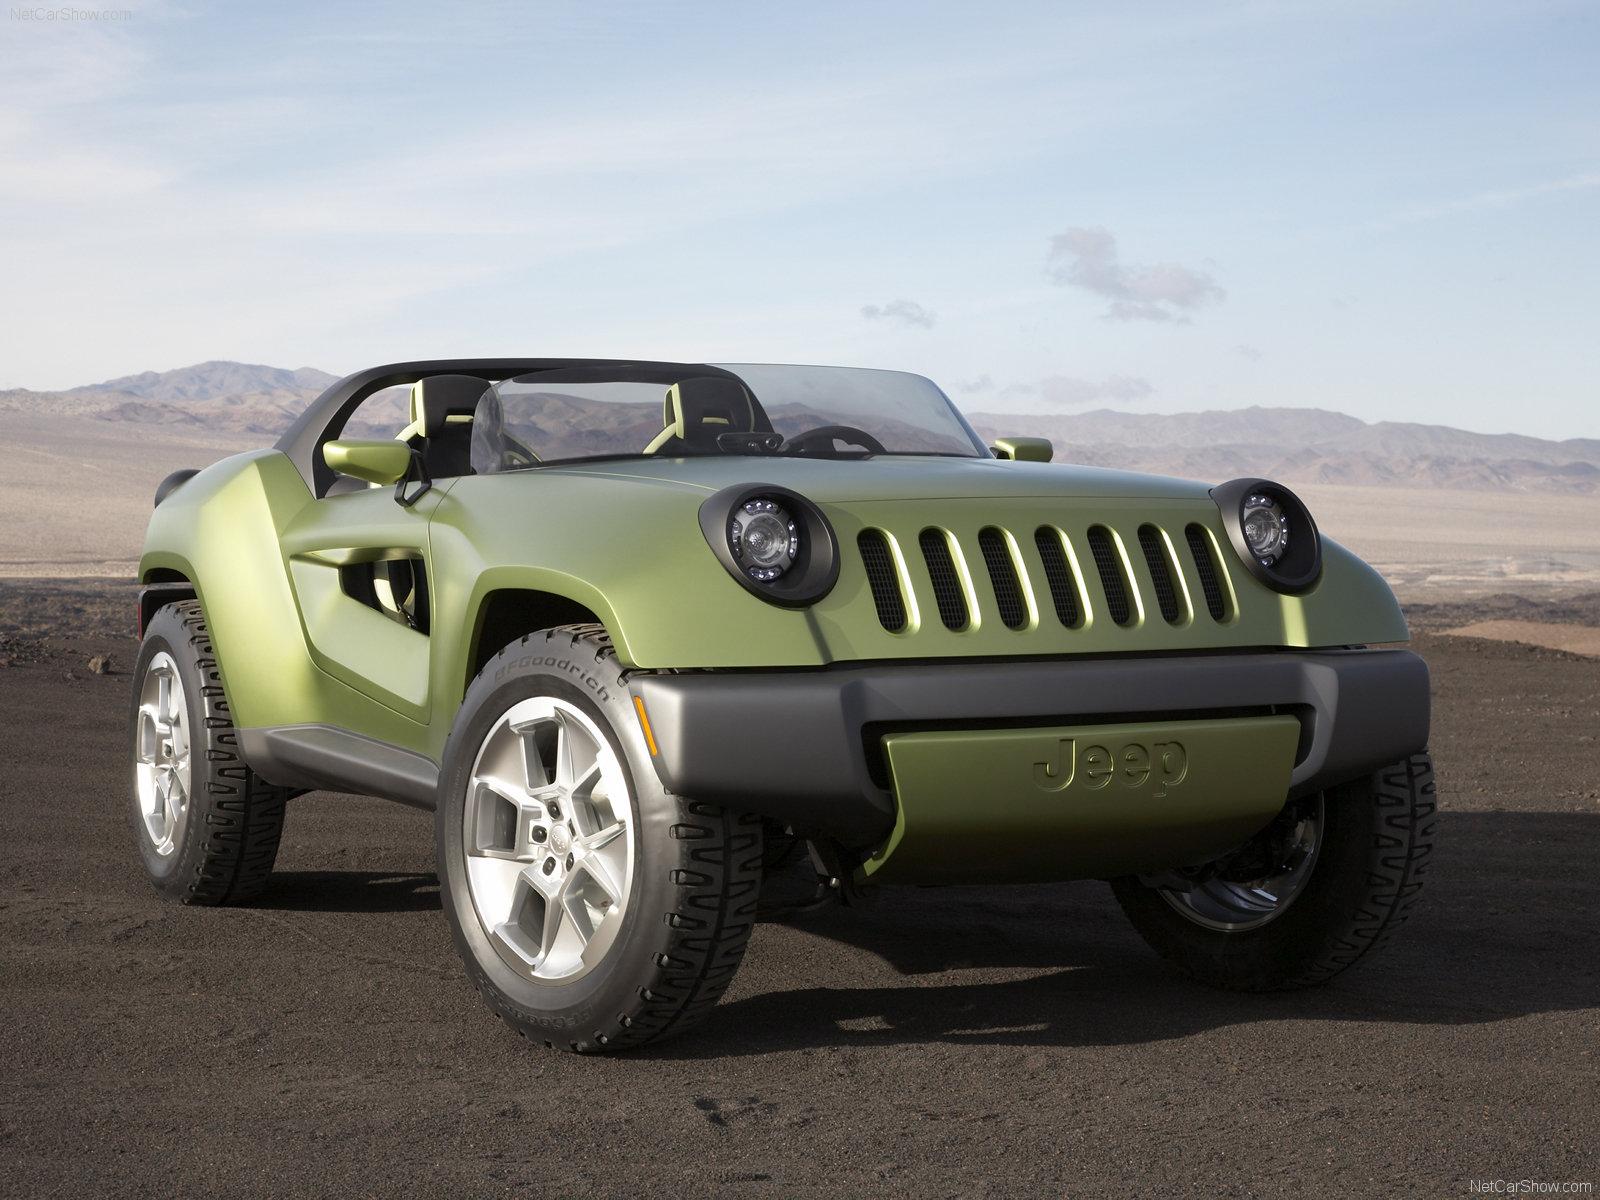 car cc jeep renegade concept 2008 car blog offers best car models designs reviews pictures. Black Bedroom Furniture Sets. Home Design Ideas